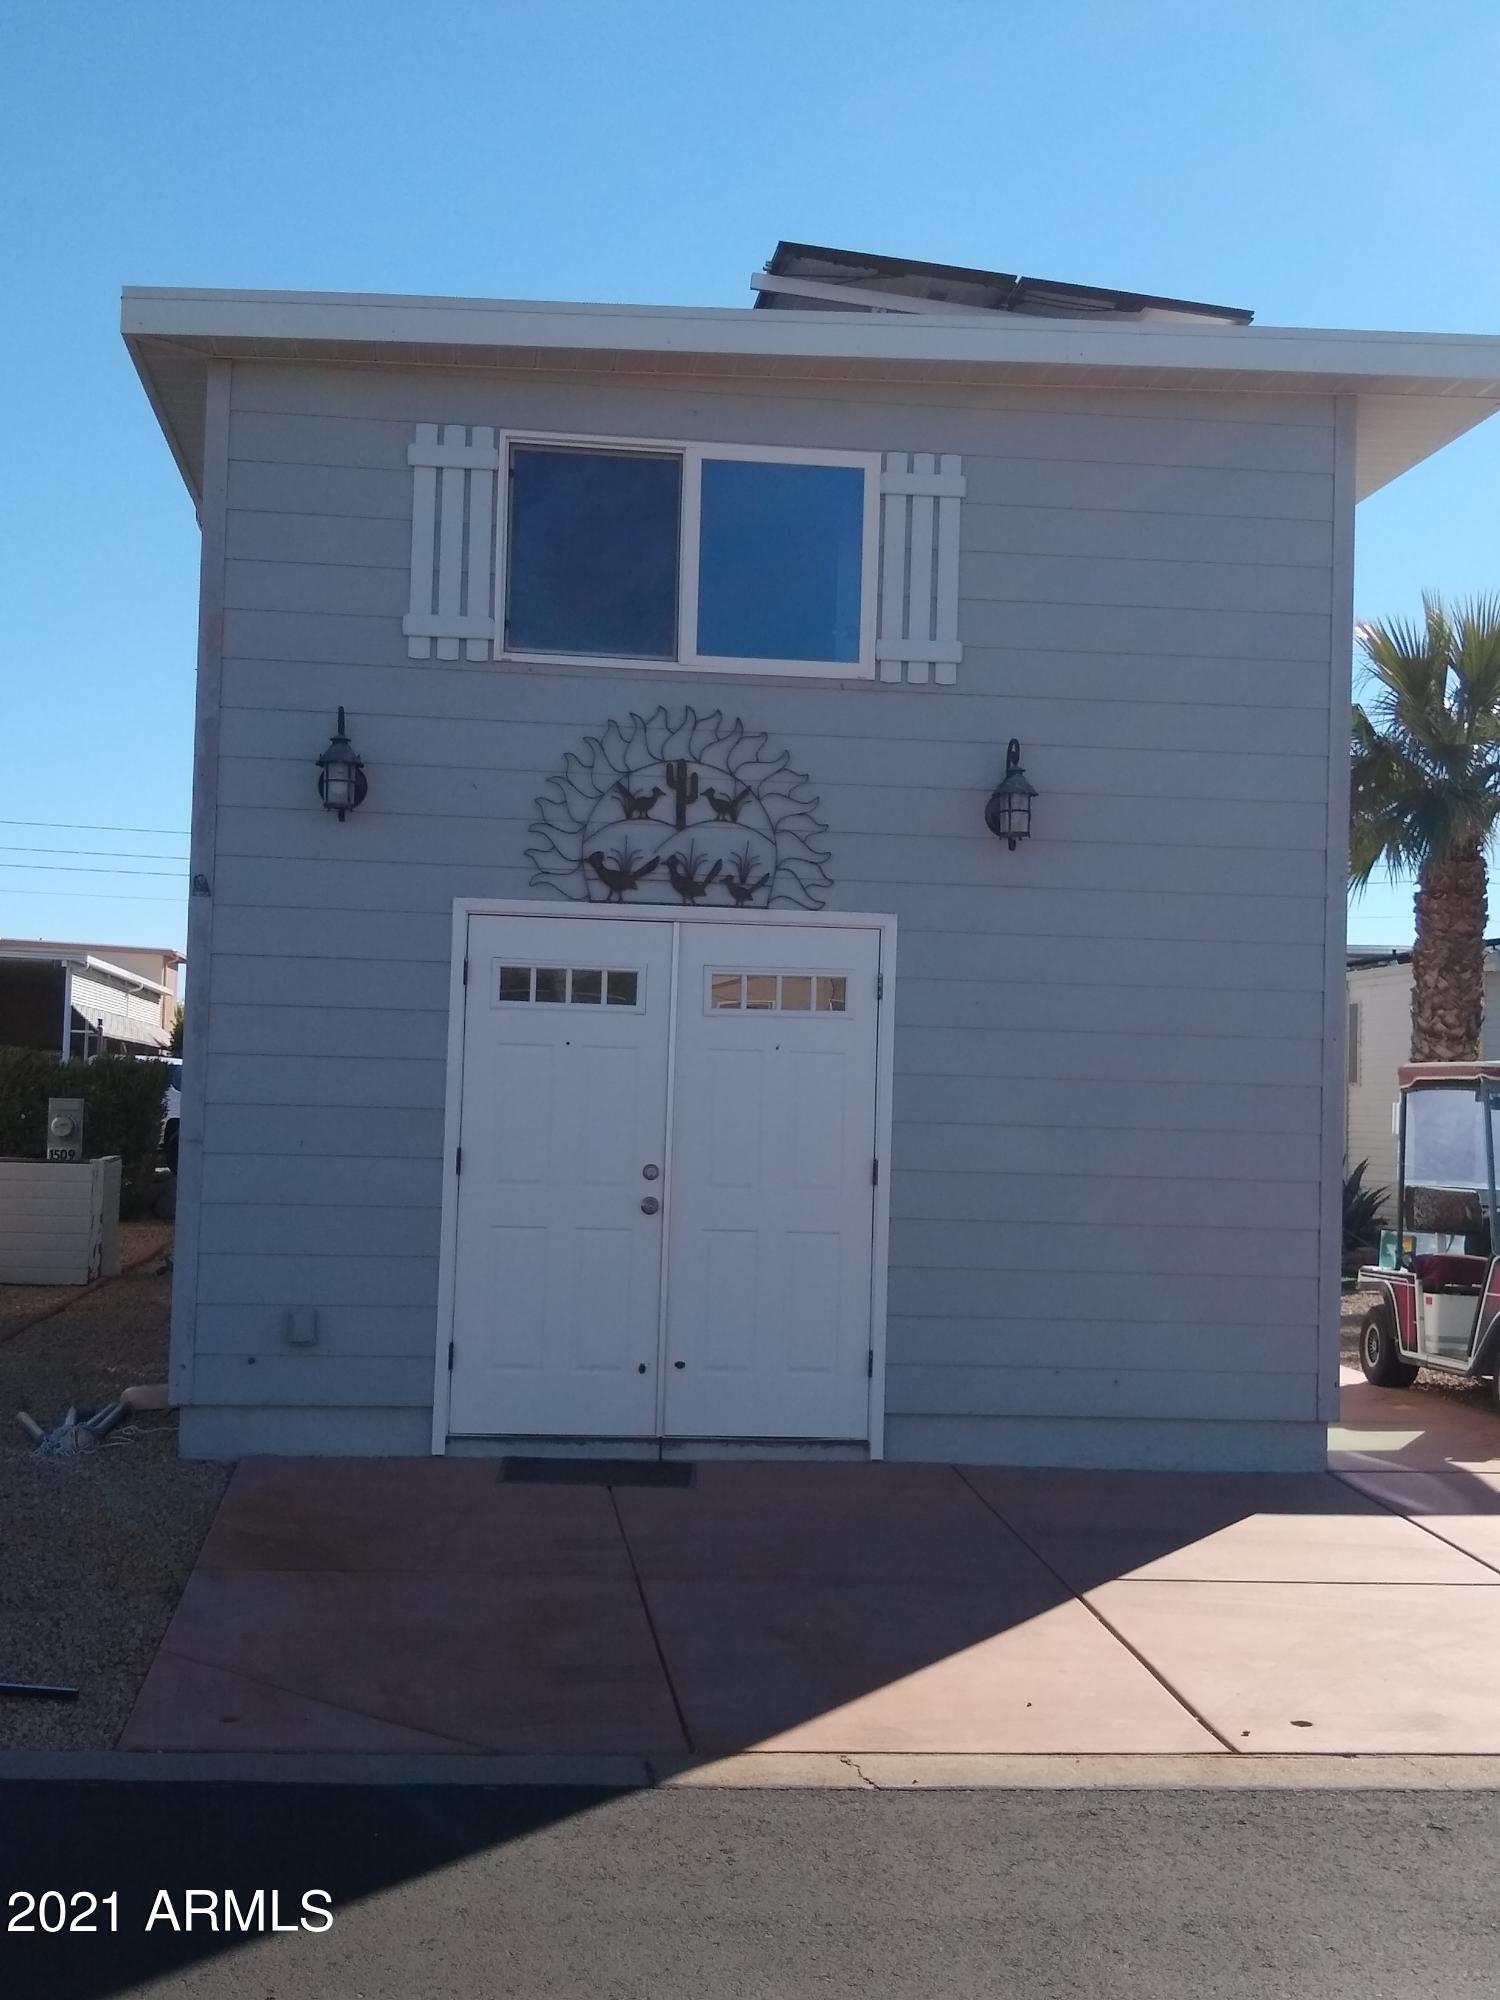 17200 W BELL Road # 1508, Surprise, AZ 85374, ,Land,For Sale,17200 W BELL Road # 1508,6197026